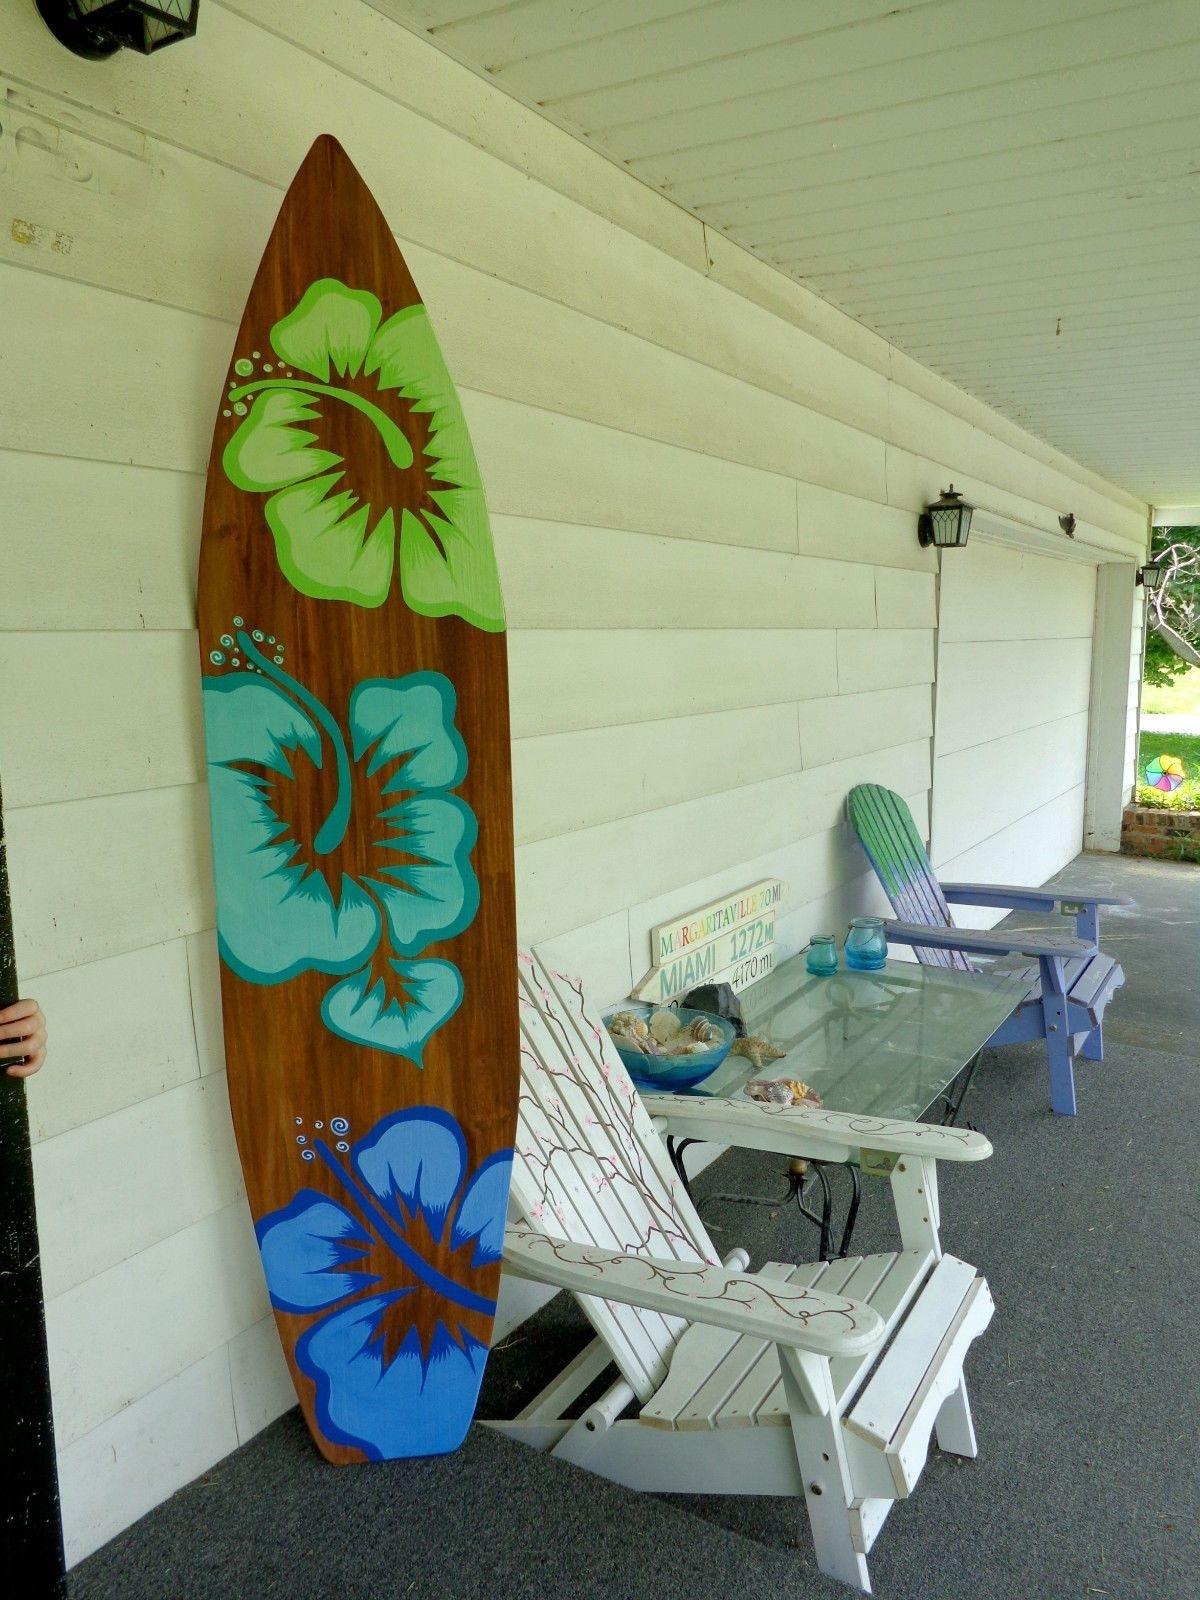 Home Decor: 6 Foot Wood Surfboard Wall Art Beach Decor Or Headboard With Regard To Surfboard Wall Art (View 6 of 20)